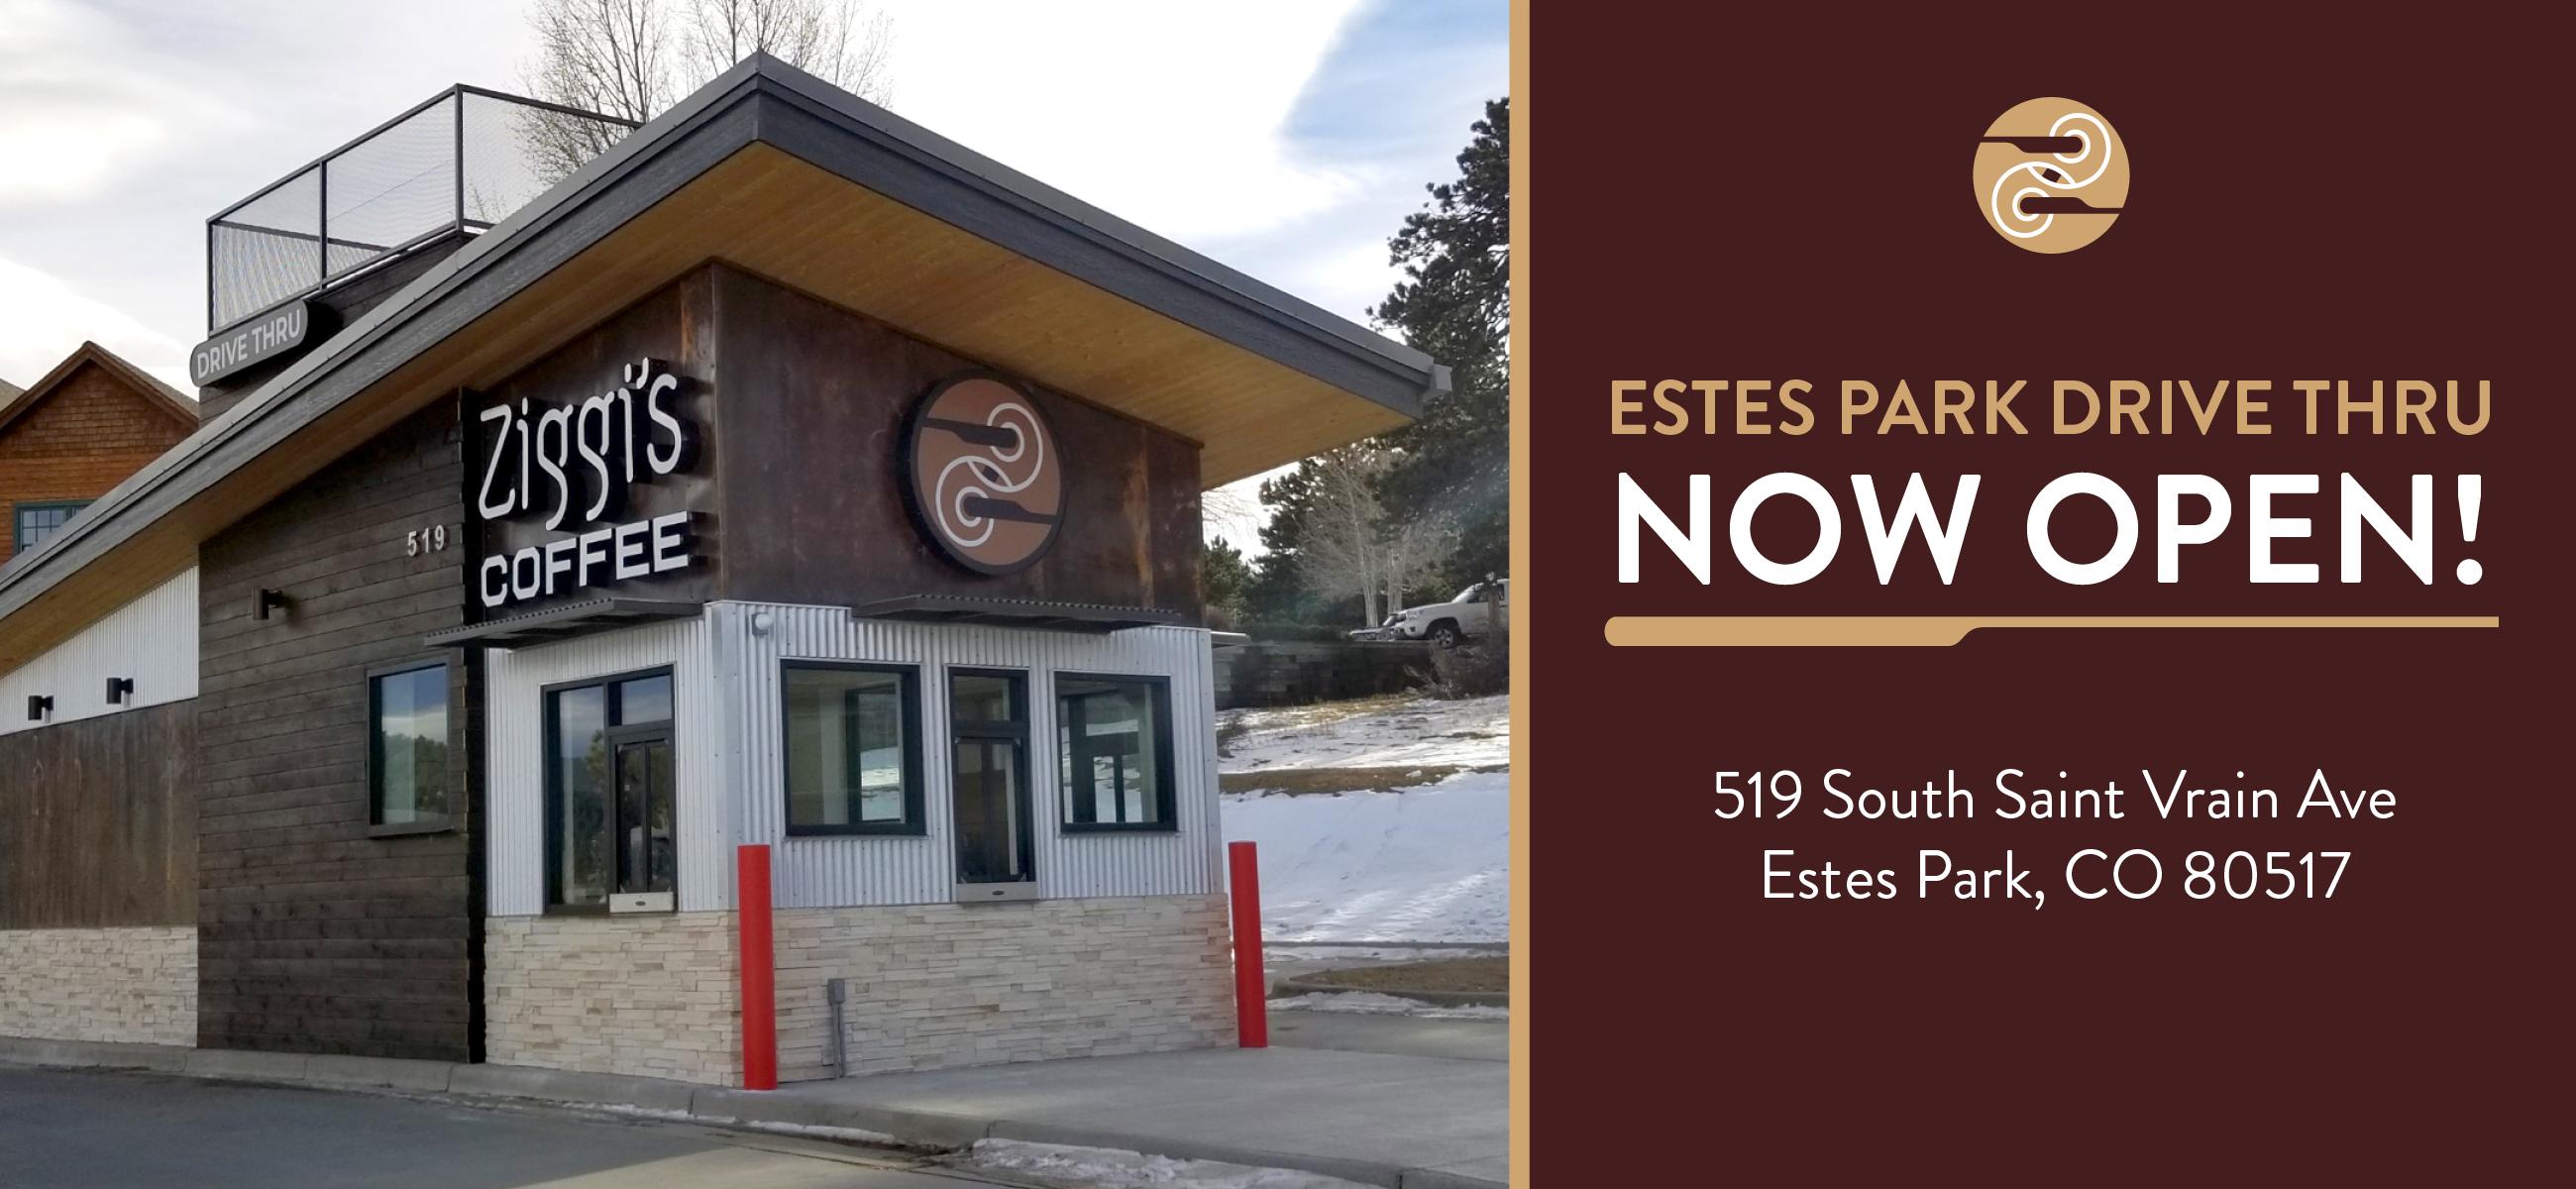 Photo of the new Ziggi's Coffee Estes Park drive thru location